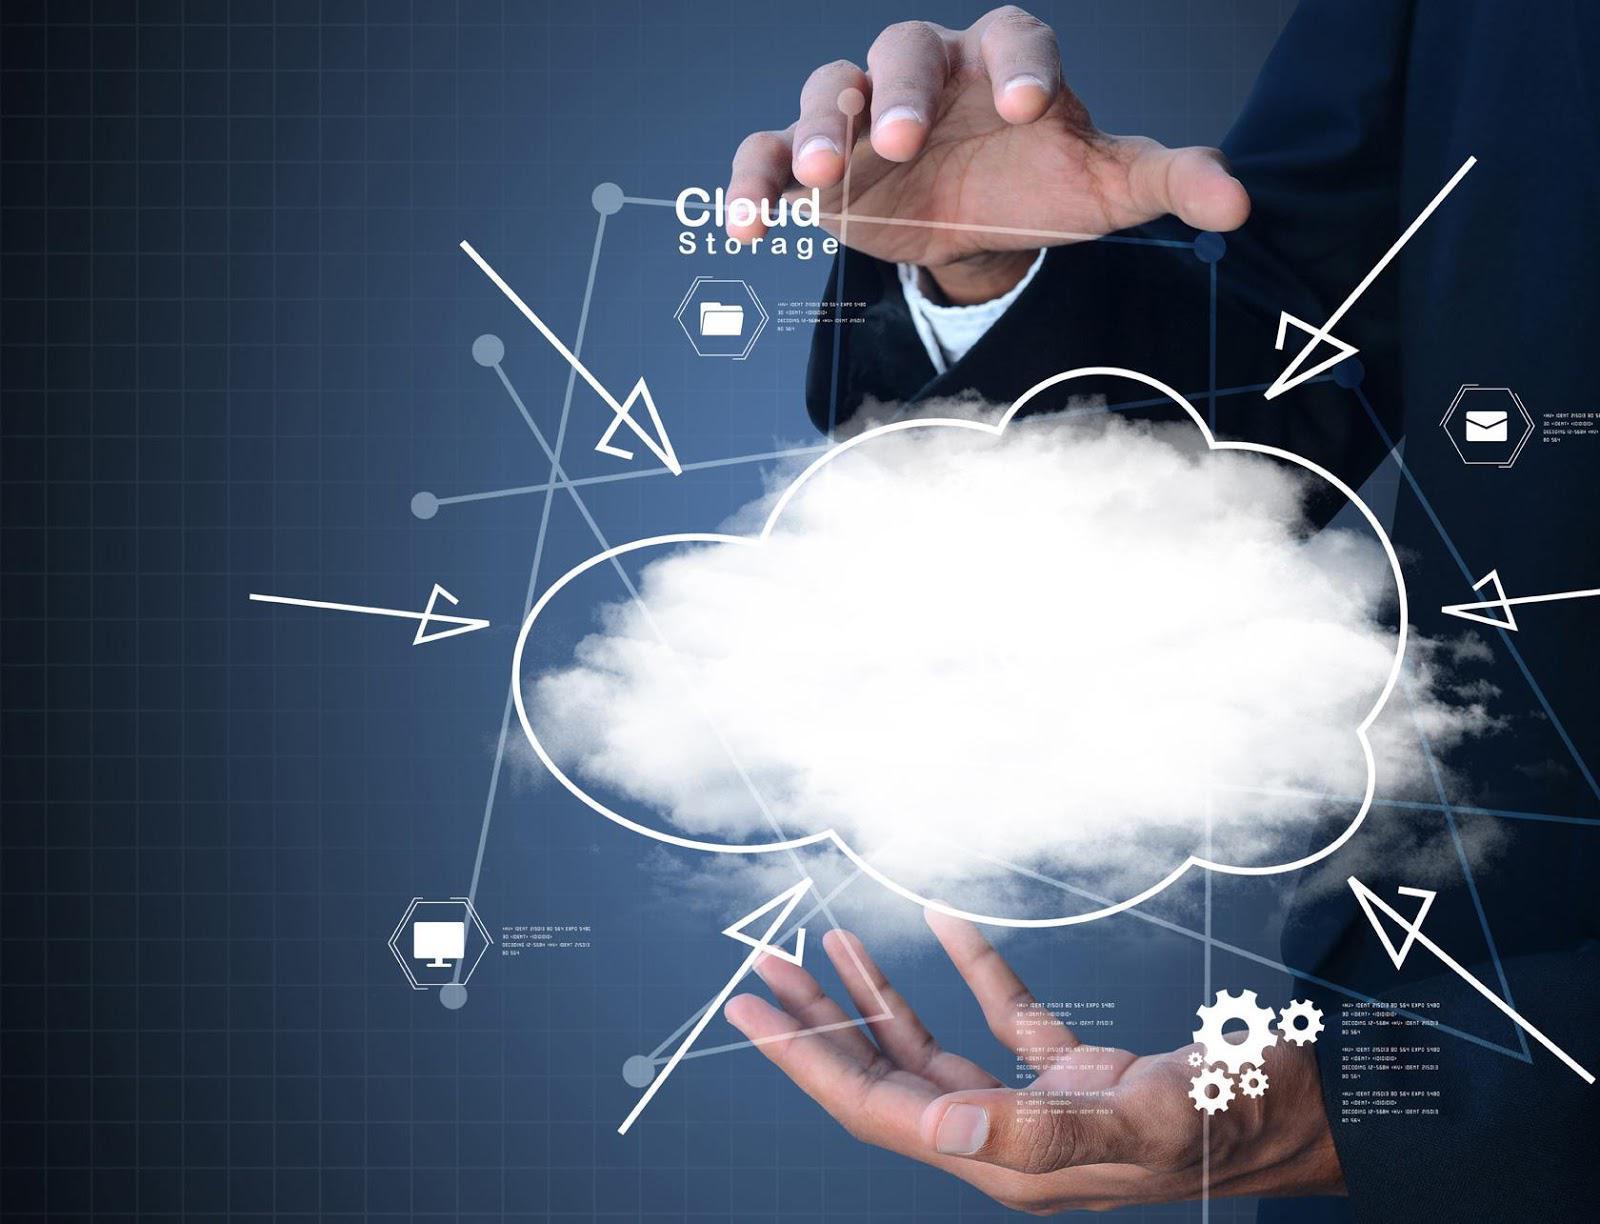 Cloud Storage 1